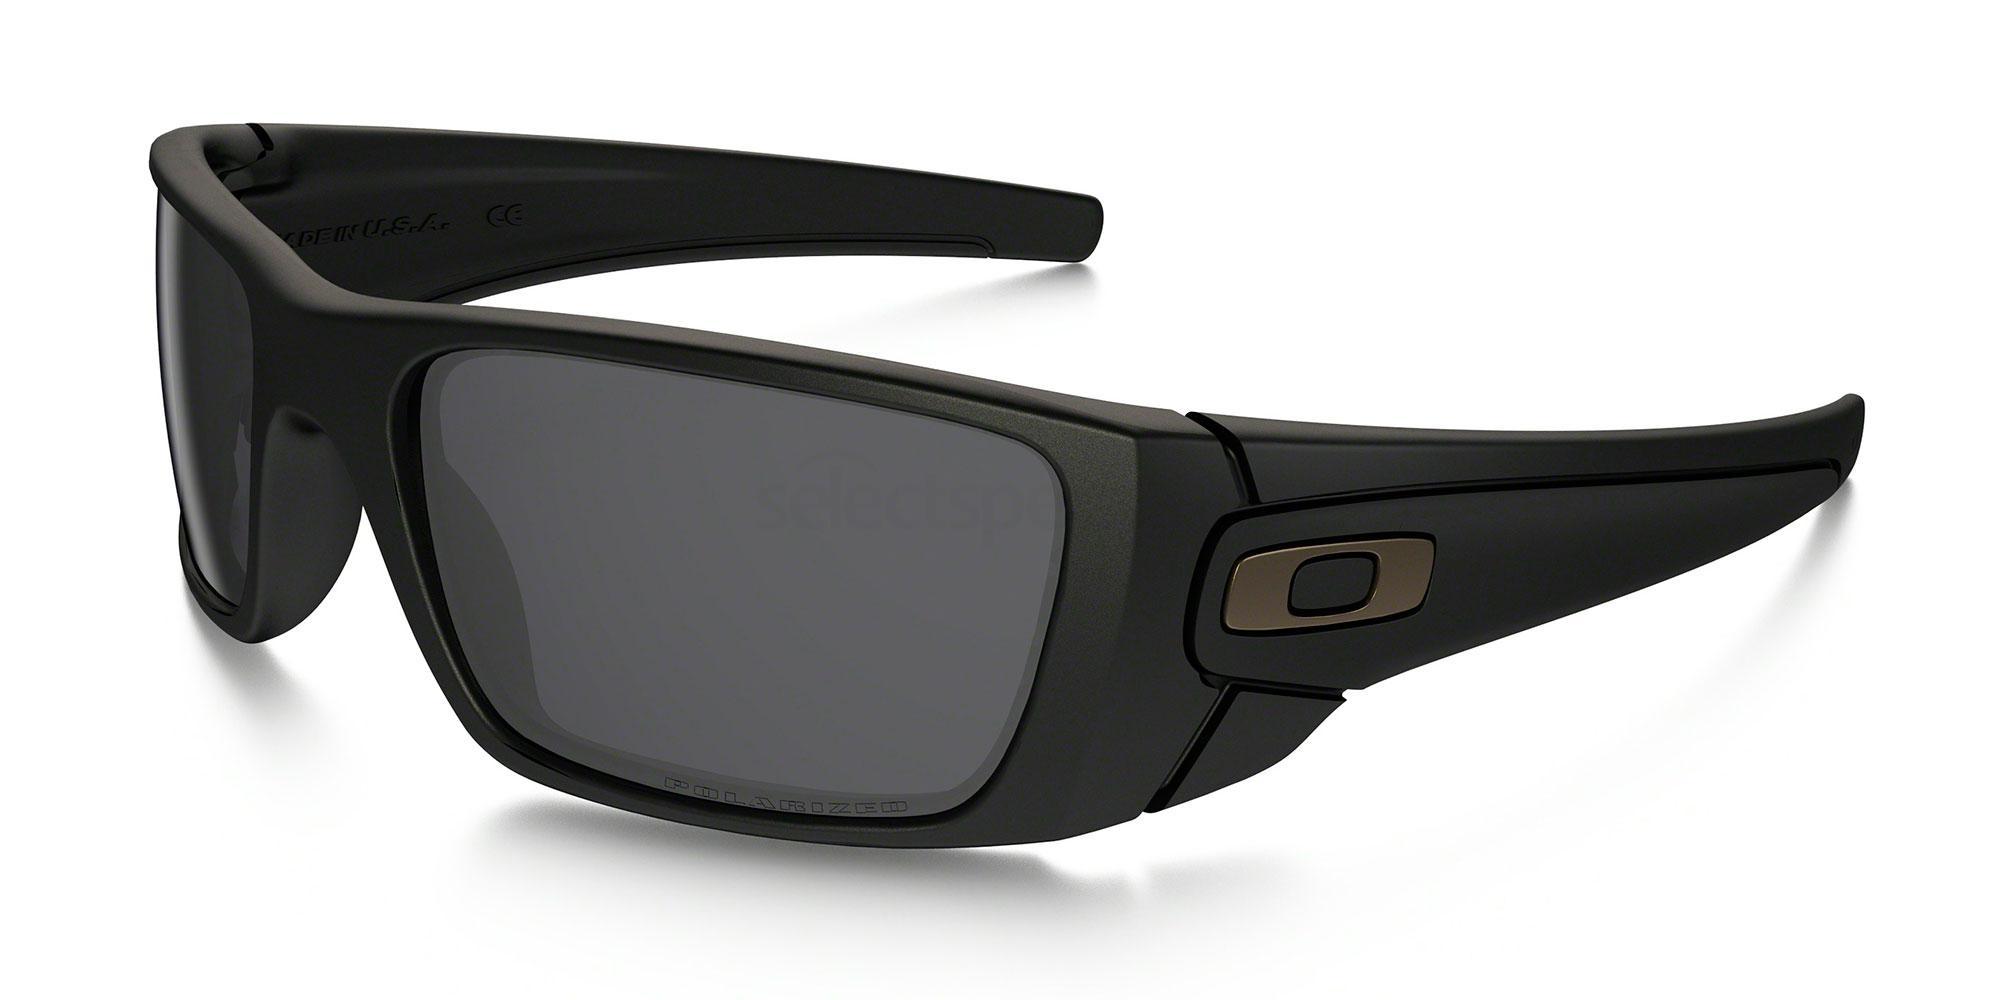 909605 OO9096 FUEL CELL (Polarized) Sunglasses, Oakley